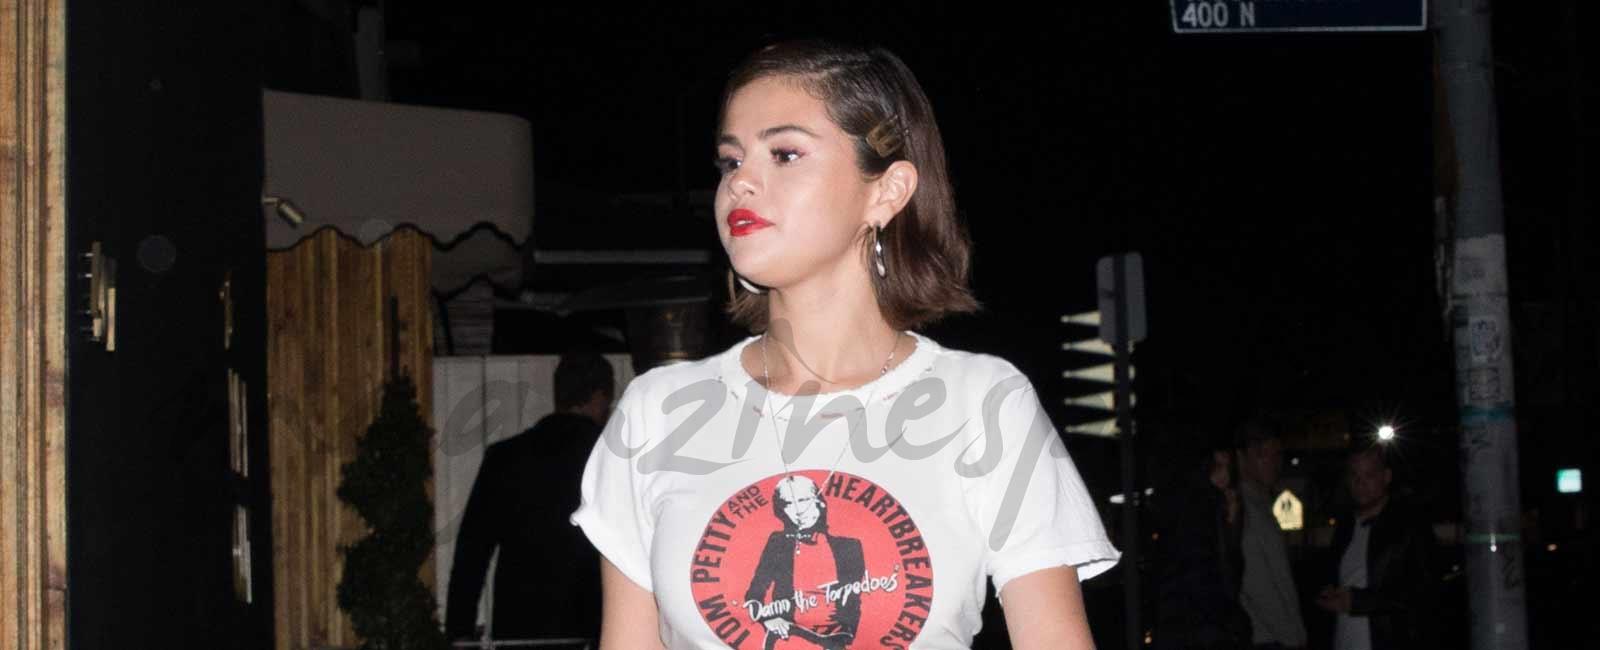 Selena Gómez, ¿Mensaje en una camiseta?